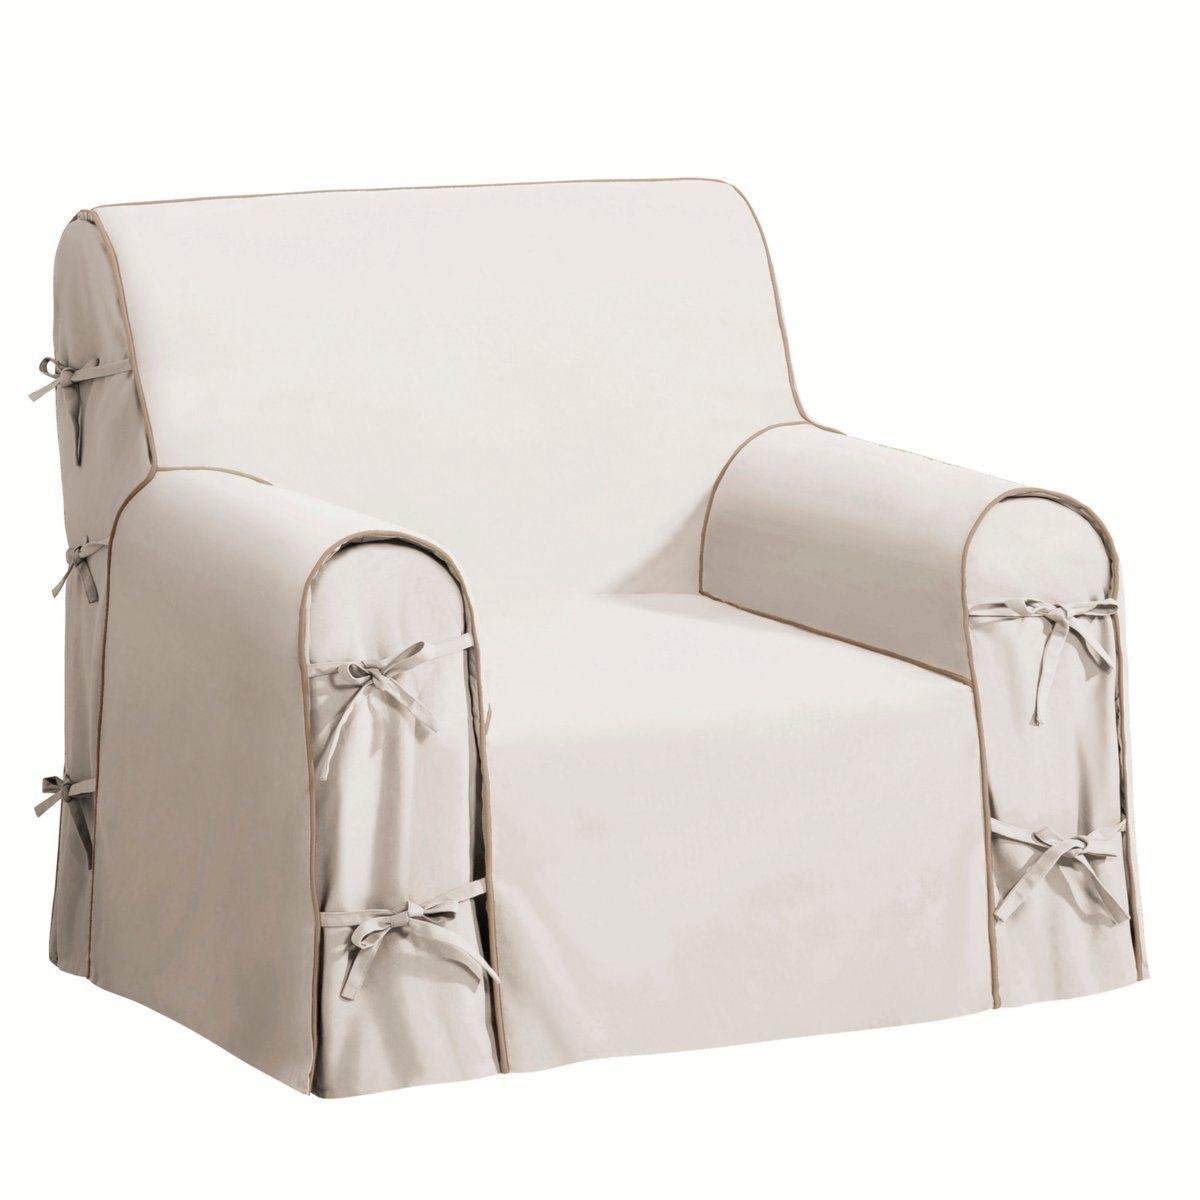 Чехол для кресла, BRIDGY.